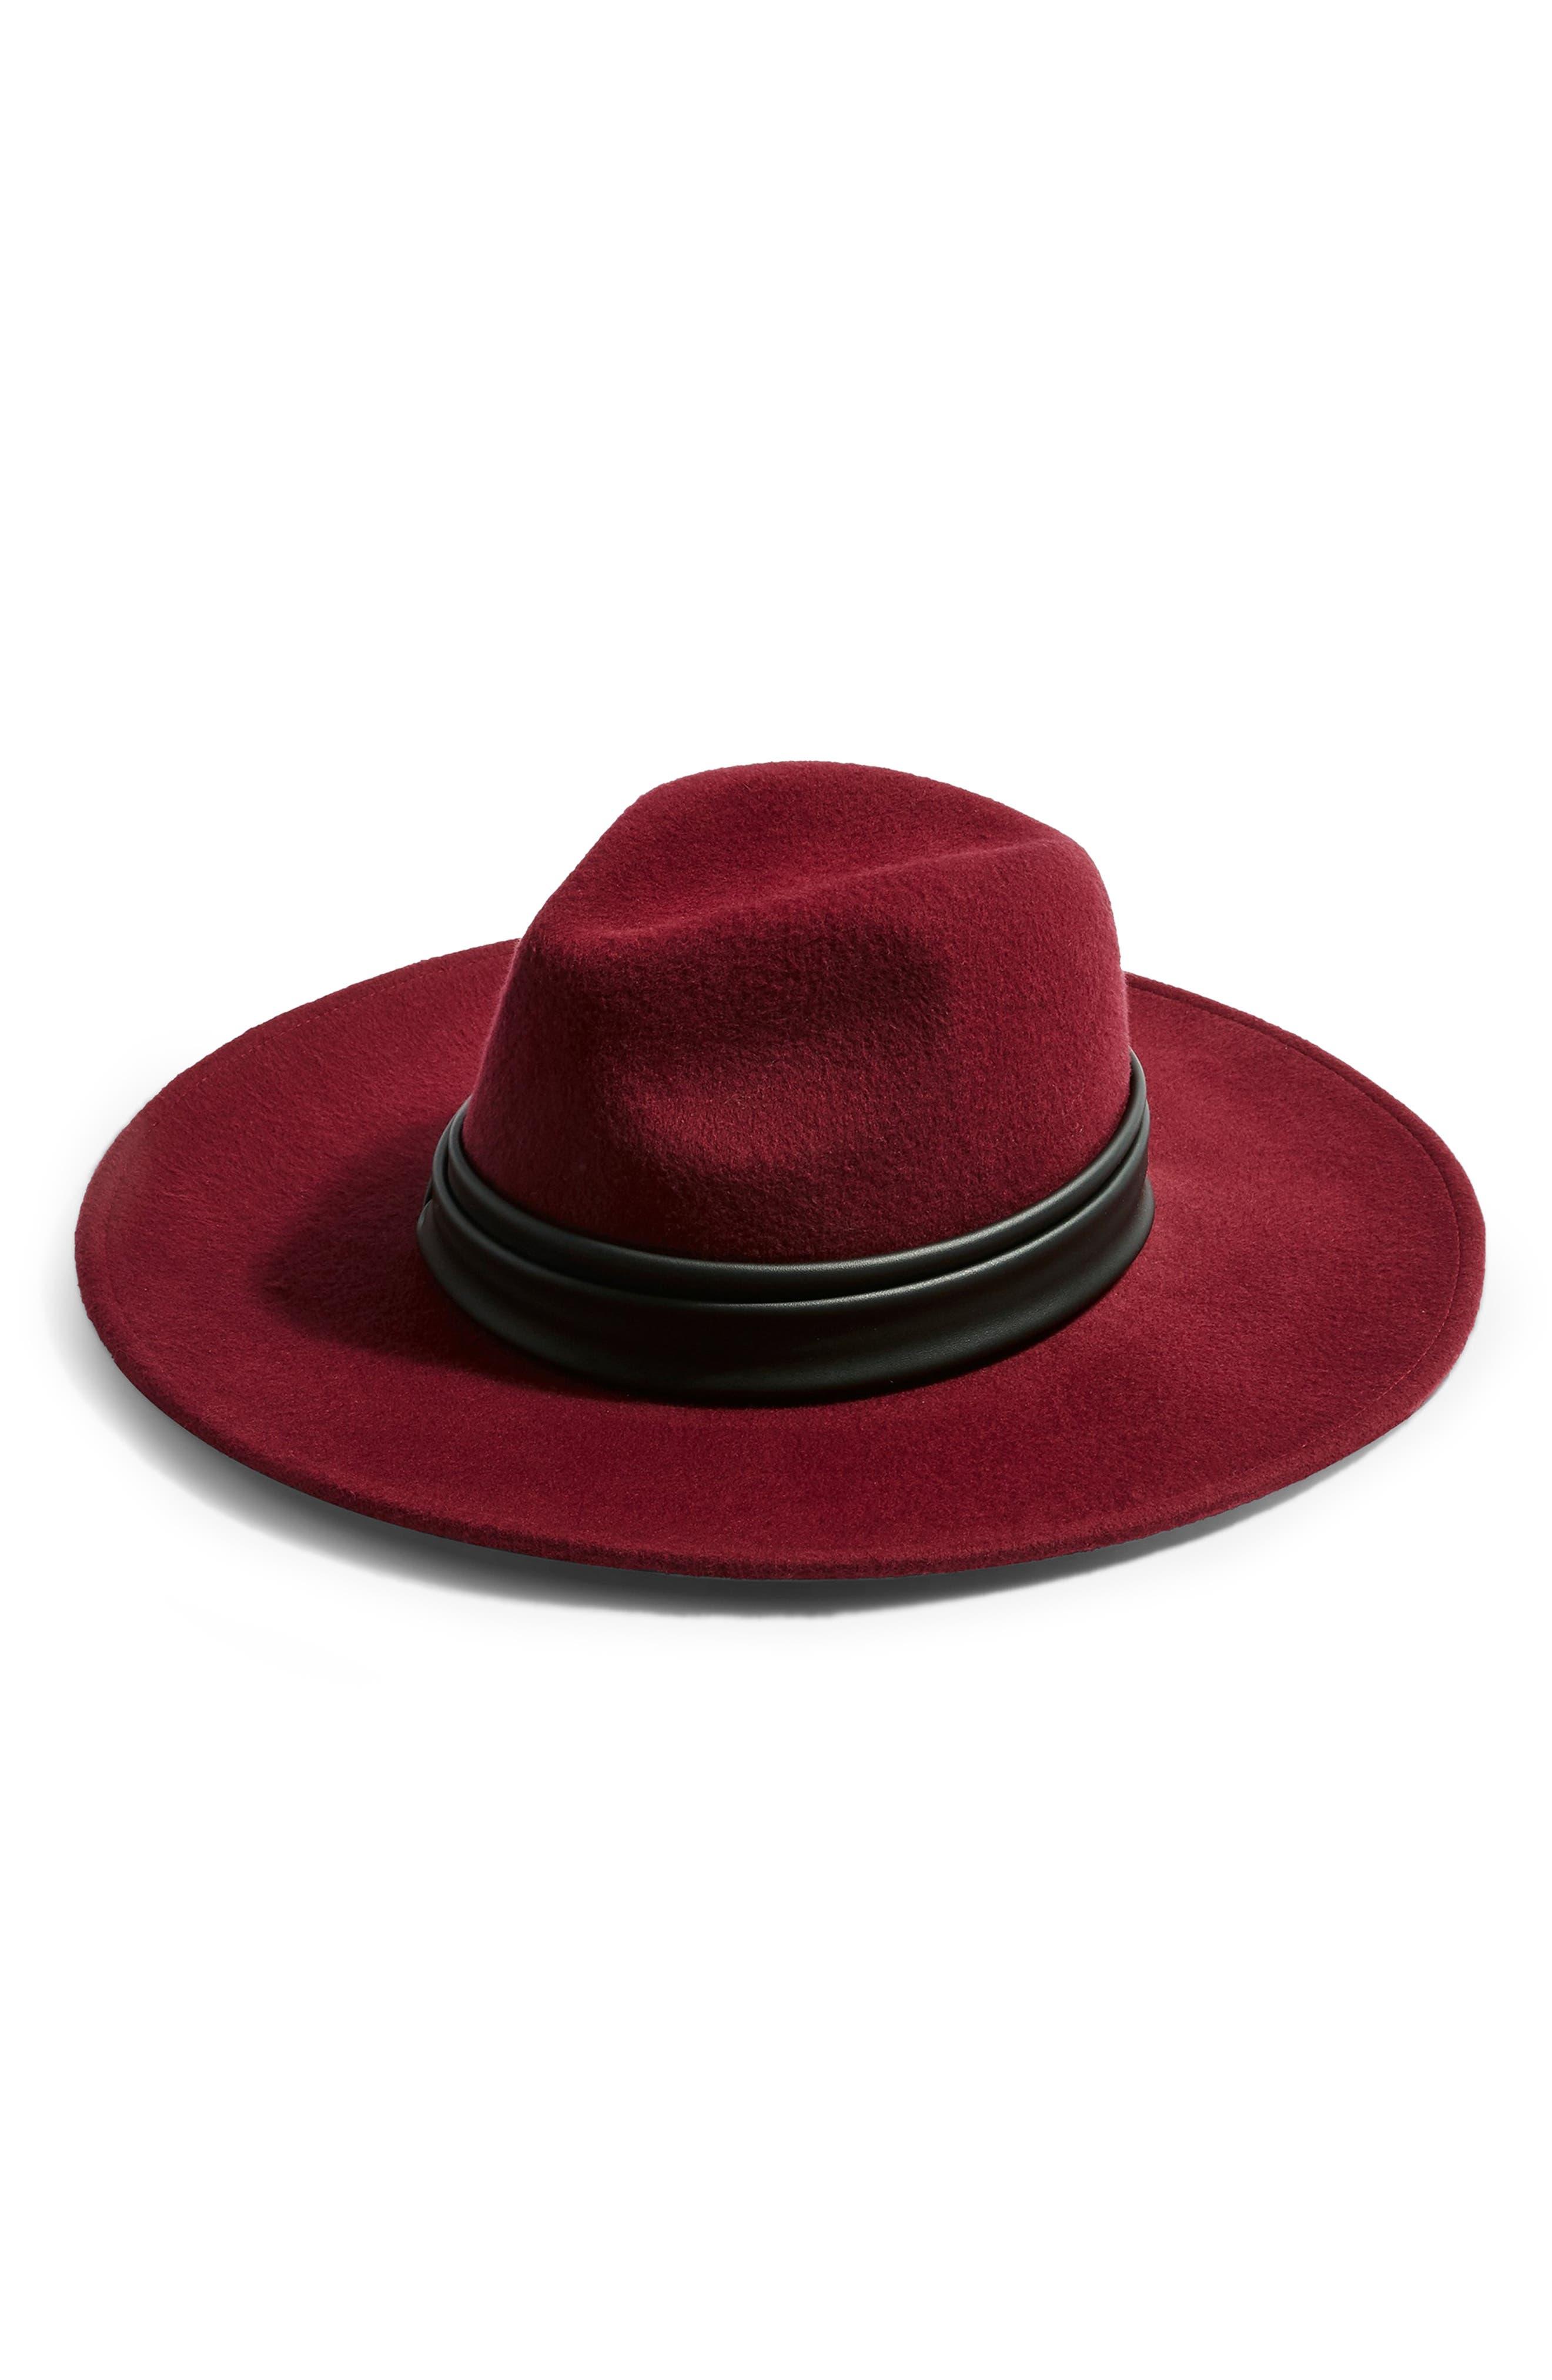 Rockit Wool Felt Panama Hat,                             Main thumbnail 1, color,                             BURGUNDY MULTI